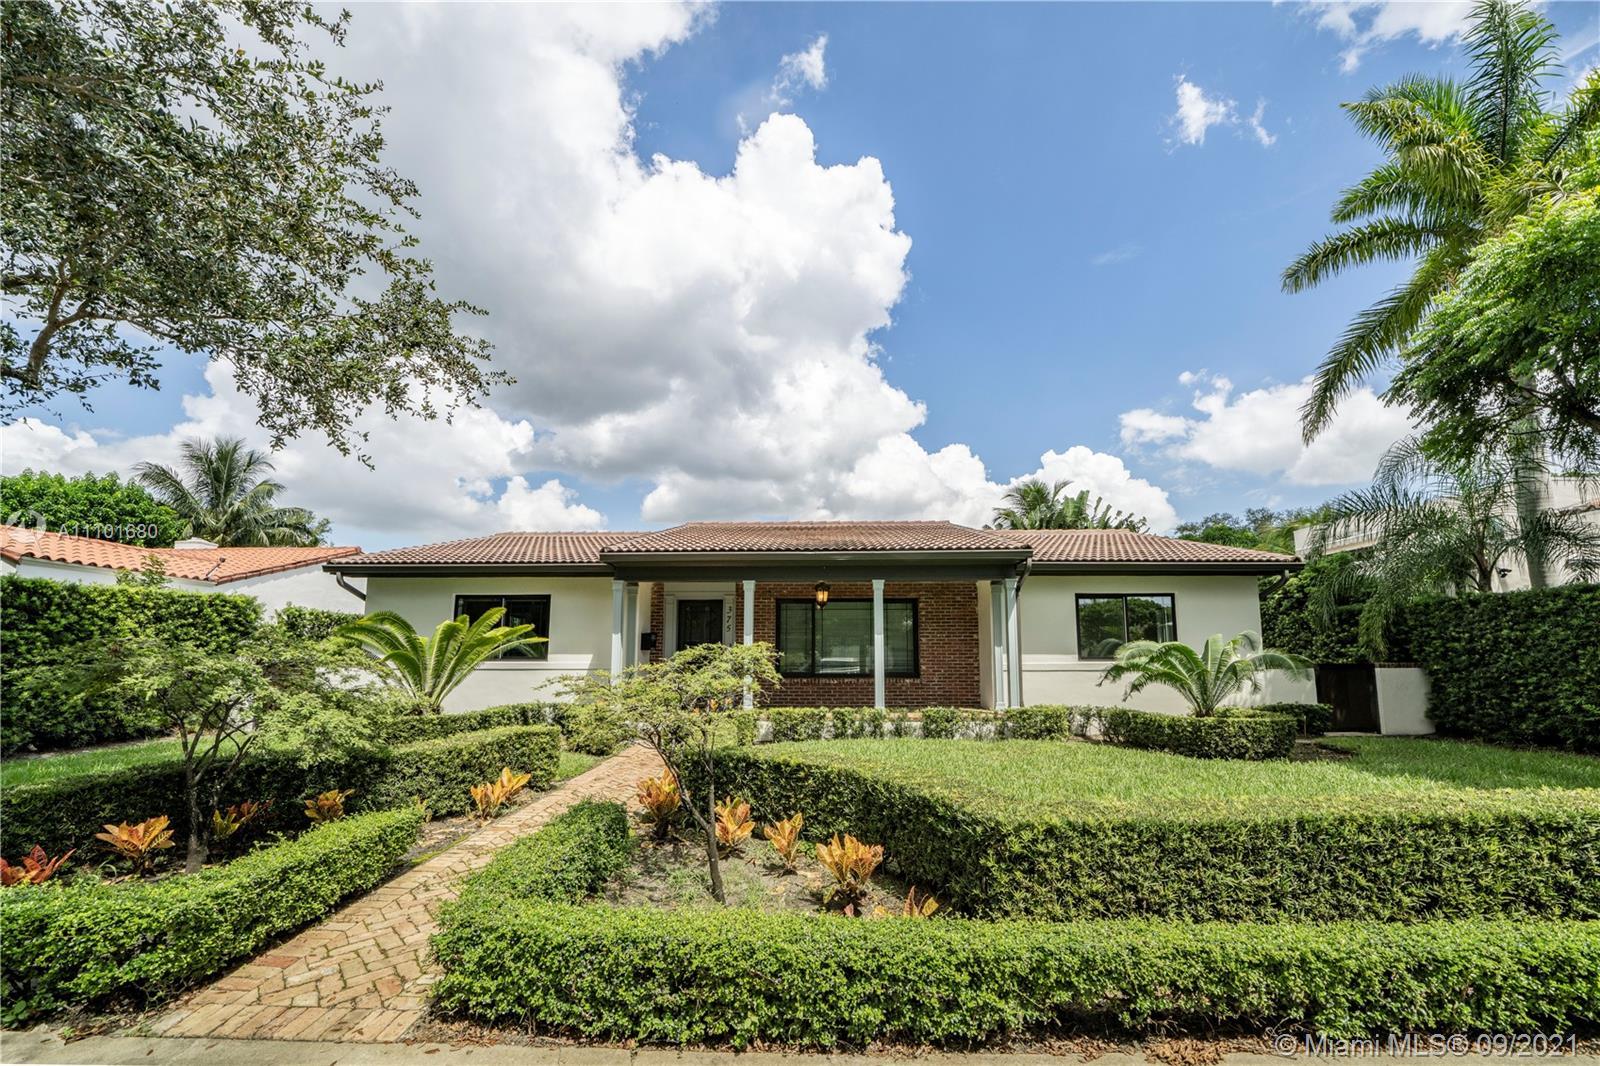 Single Family Home For Rent MIAMI SHORES SEC 1 AMD,Miami Shores2,496 S